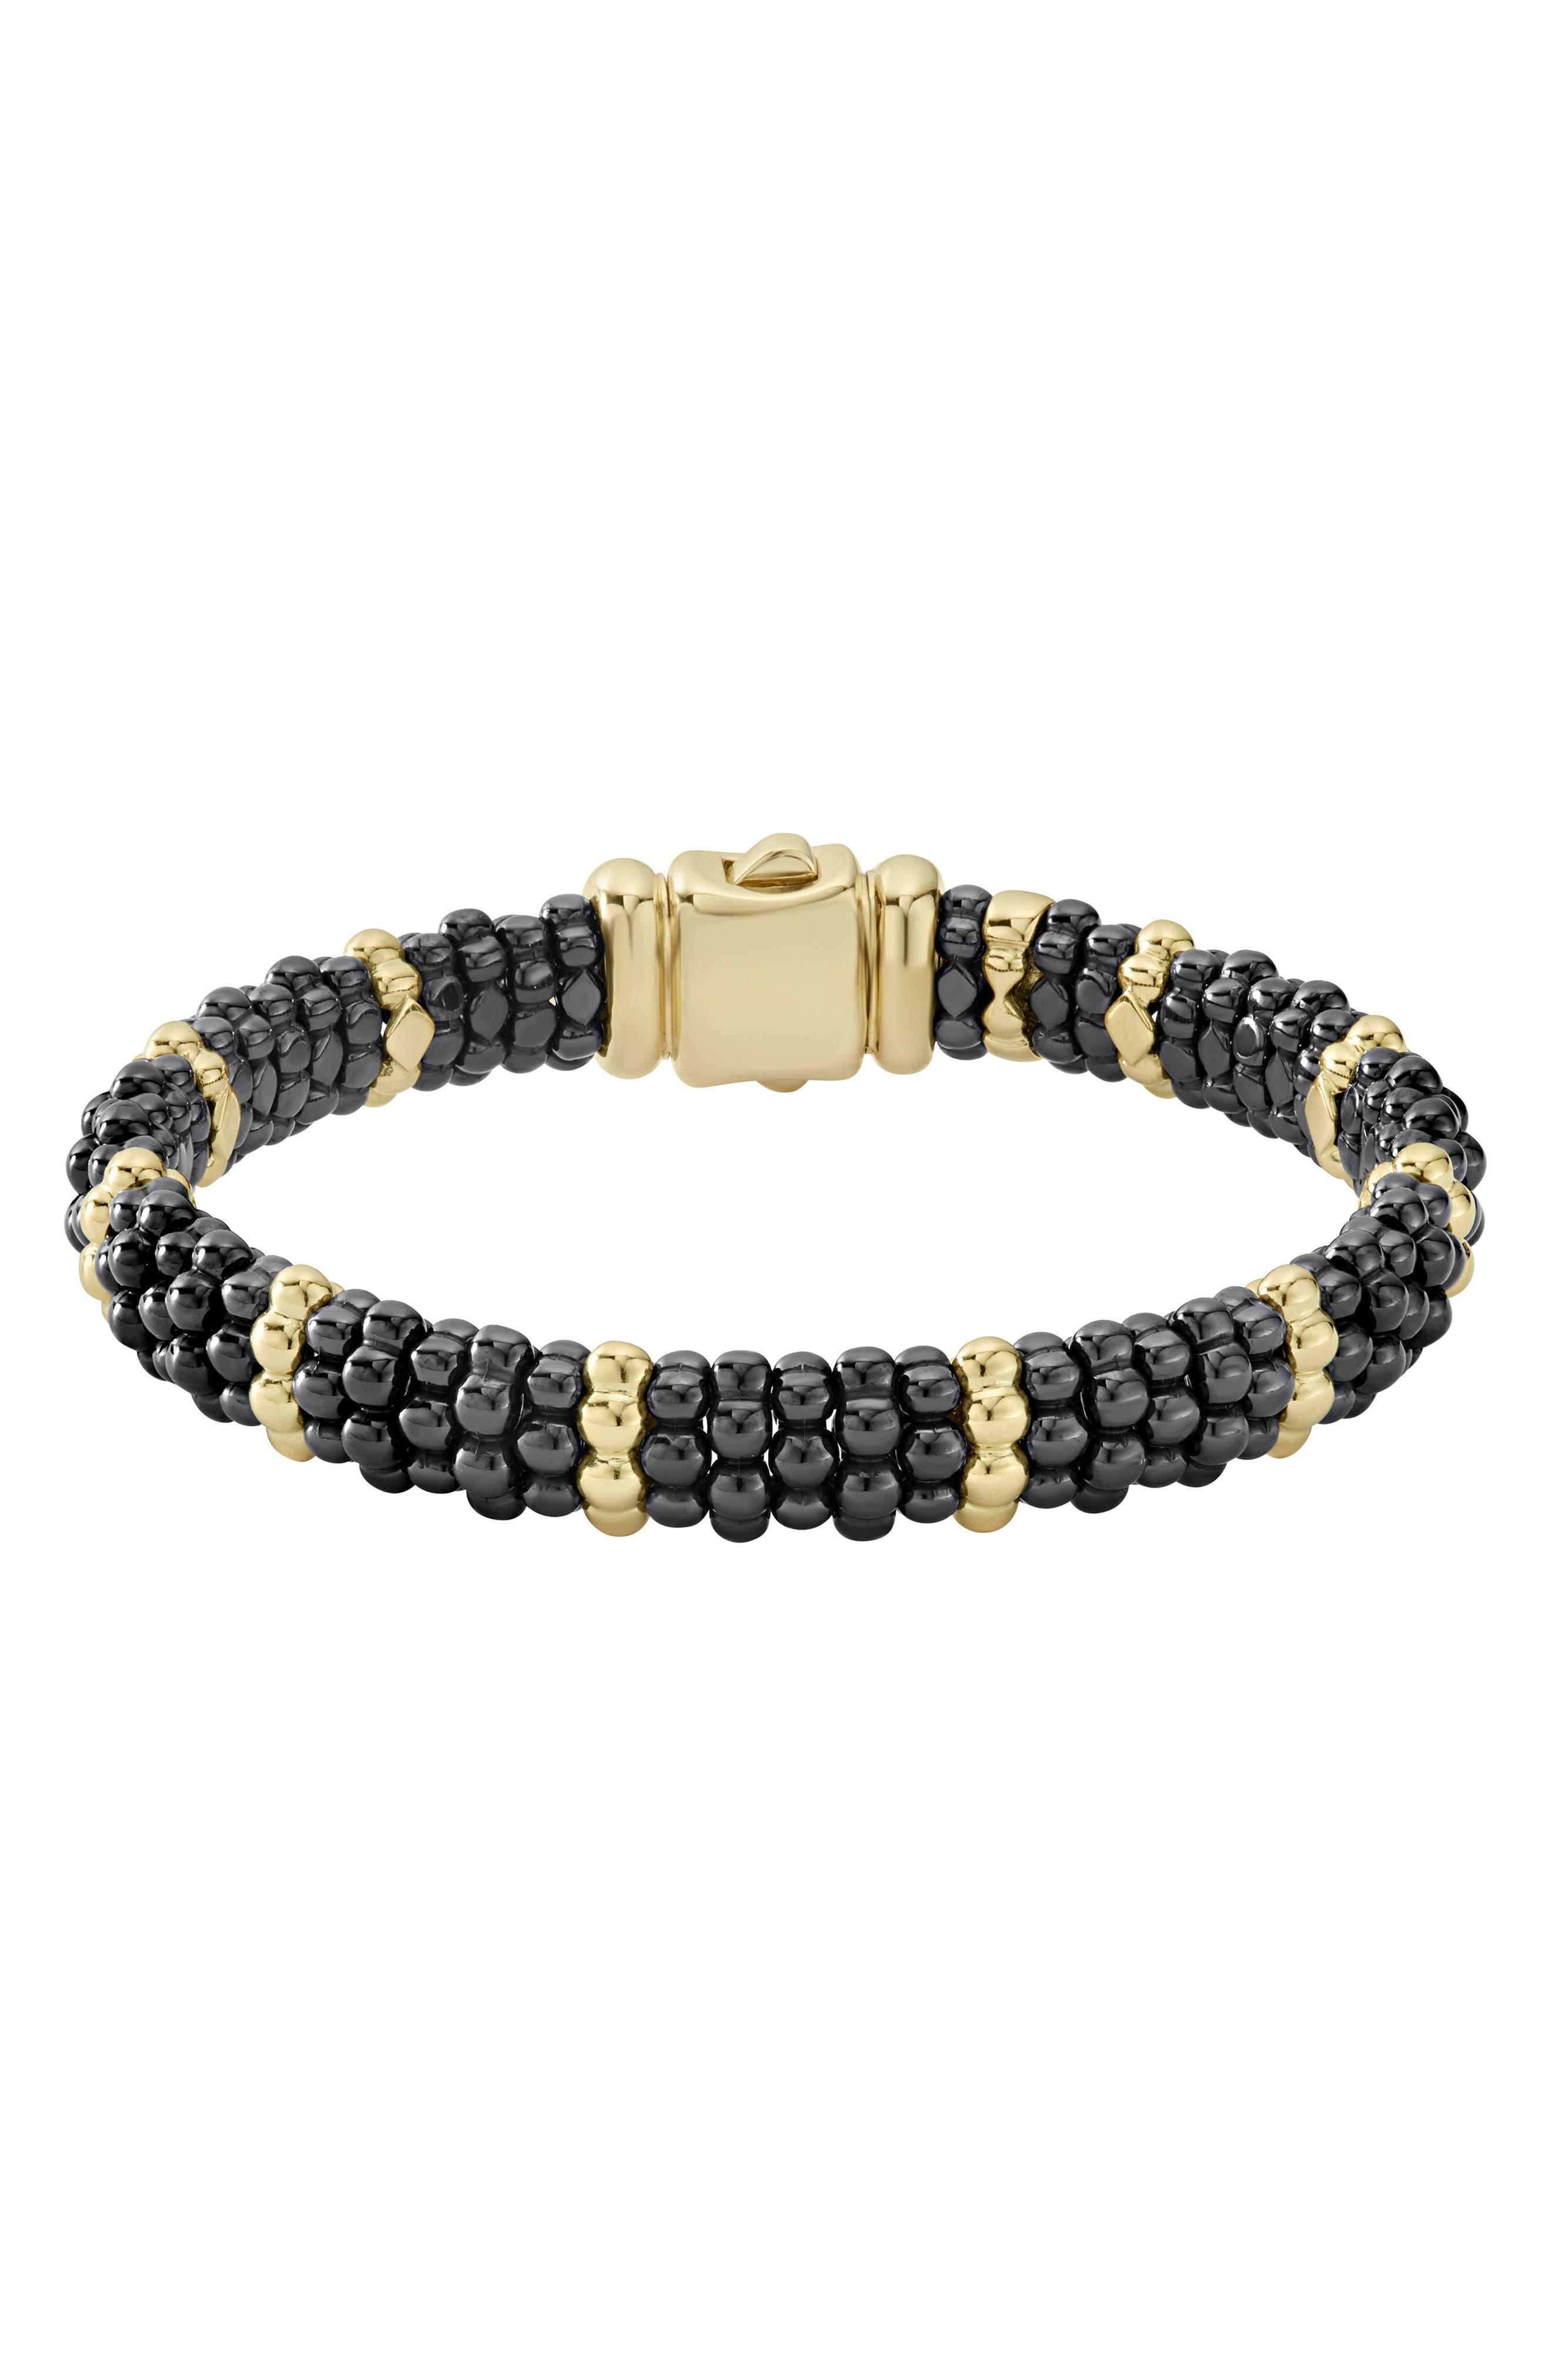 Gold & Black Caviar Station Bracelet,                             Main thumbnail 1, color,                             GOLD/ BLACK